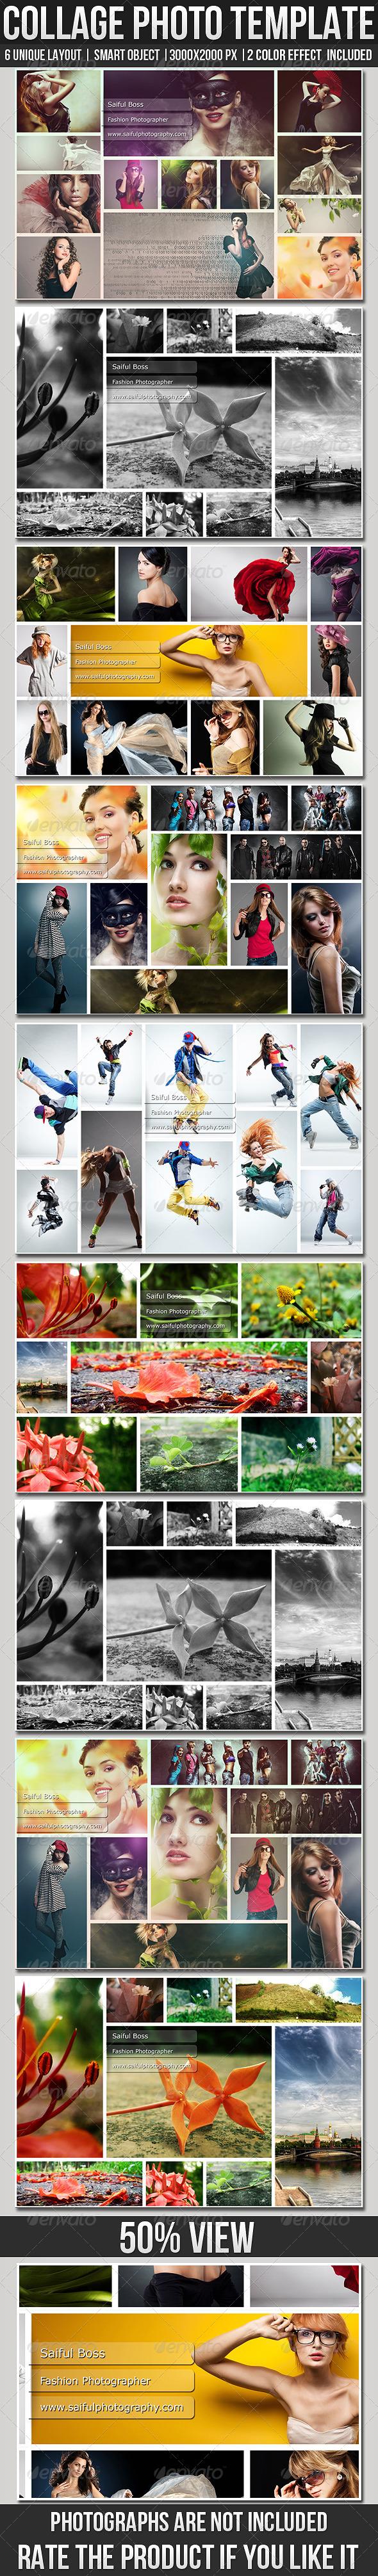 GraphicRiver Collage Photo Templates 6737088